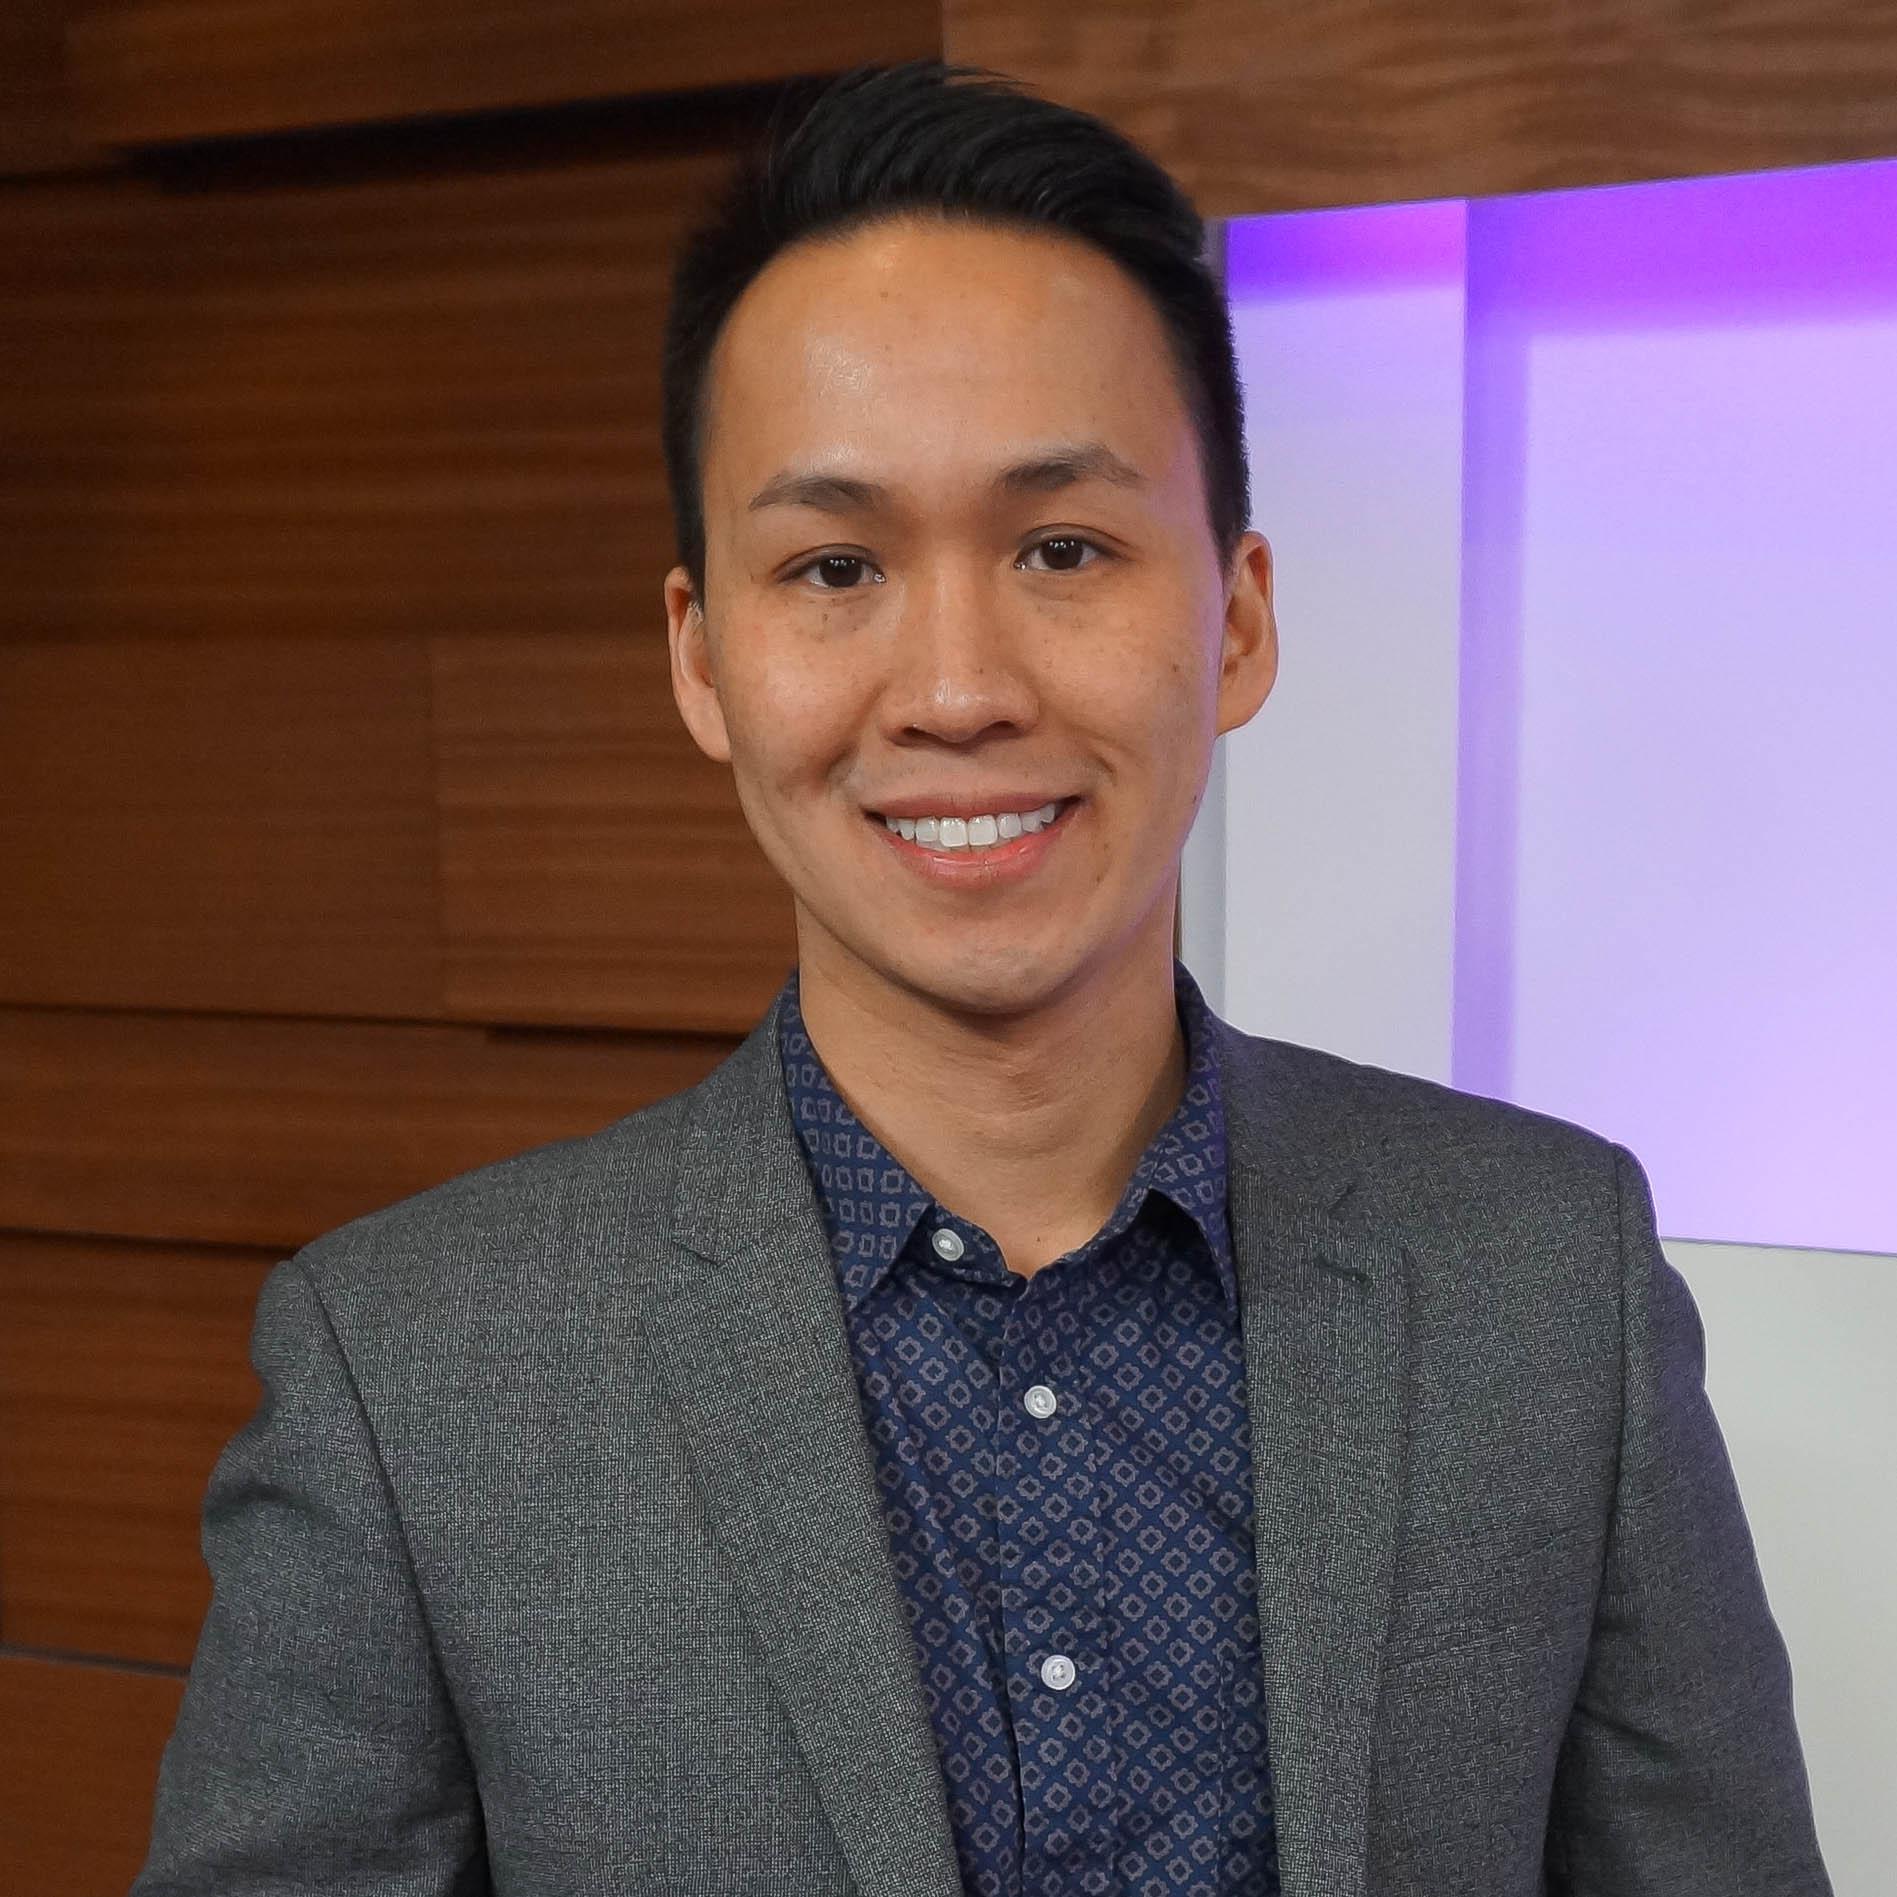 Barry Choi